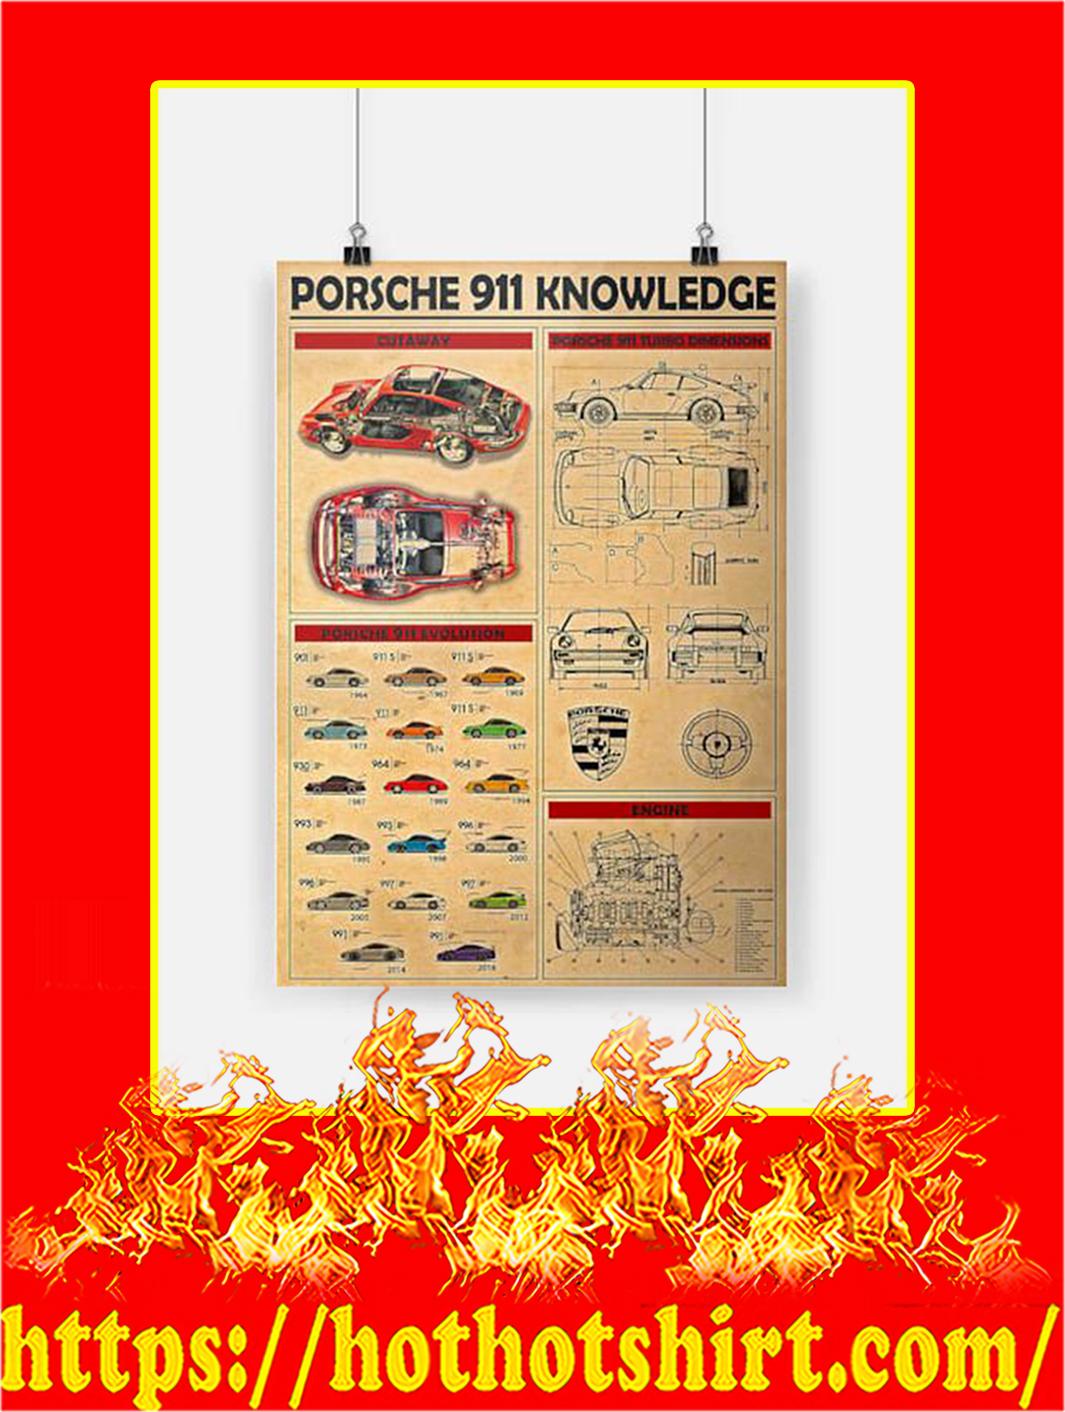 Porsche 911 Knowledge Poster - A2